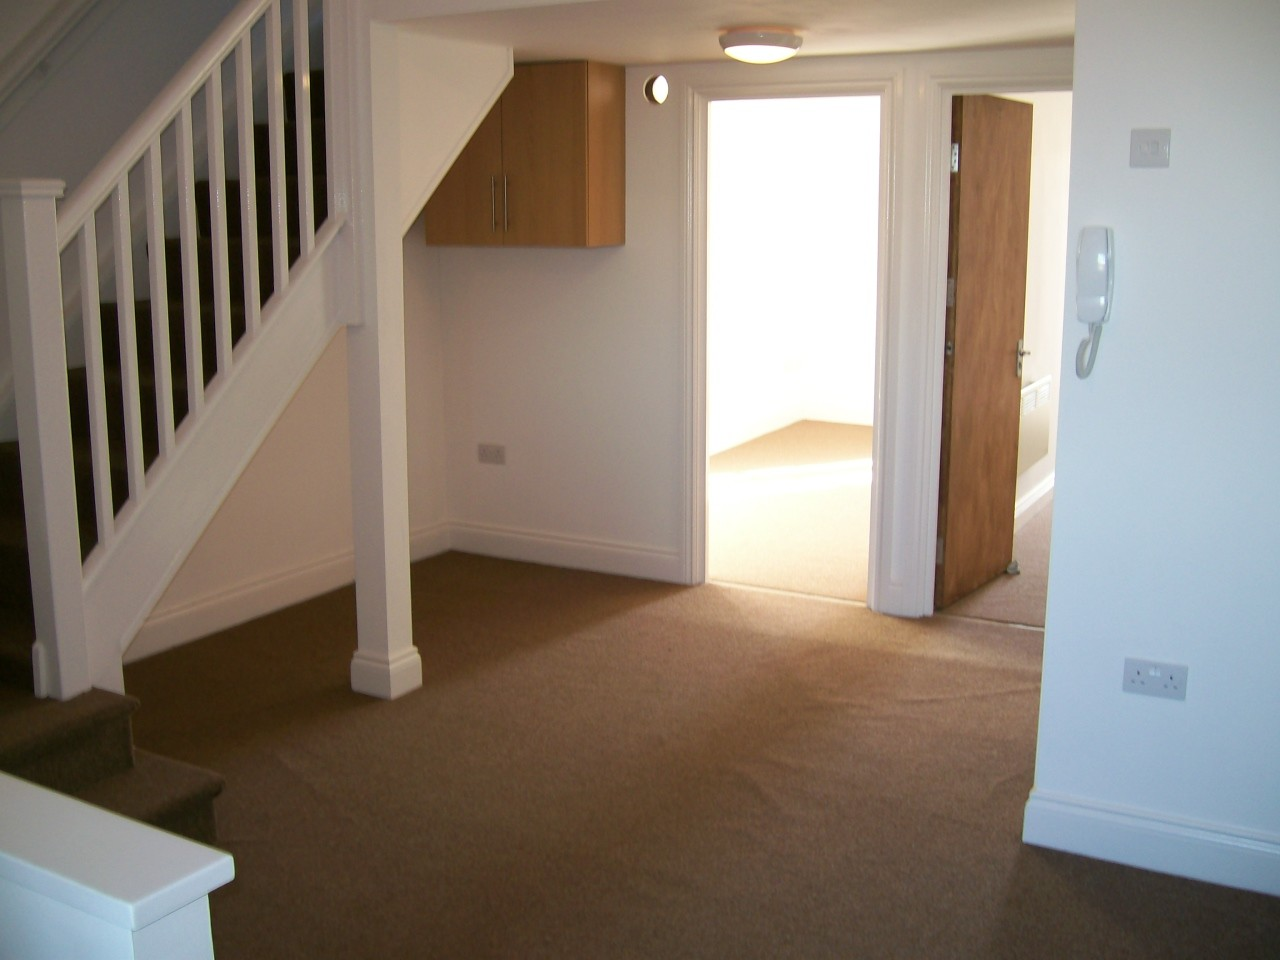 room-shared-flat-city-centre-location-76fd5b1c0c9171ad84e01502d7a0e32d